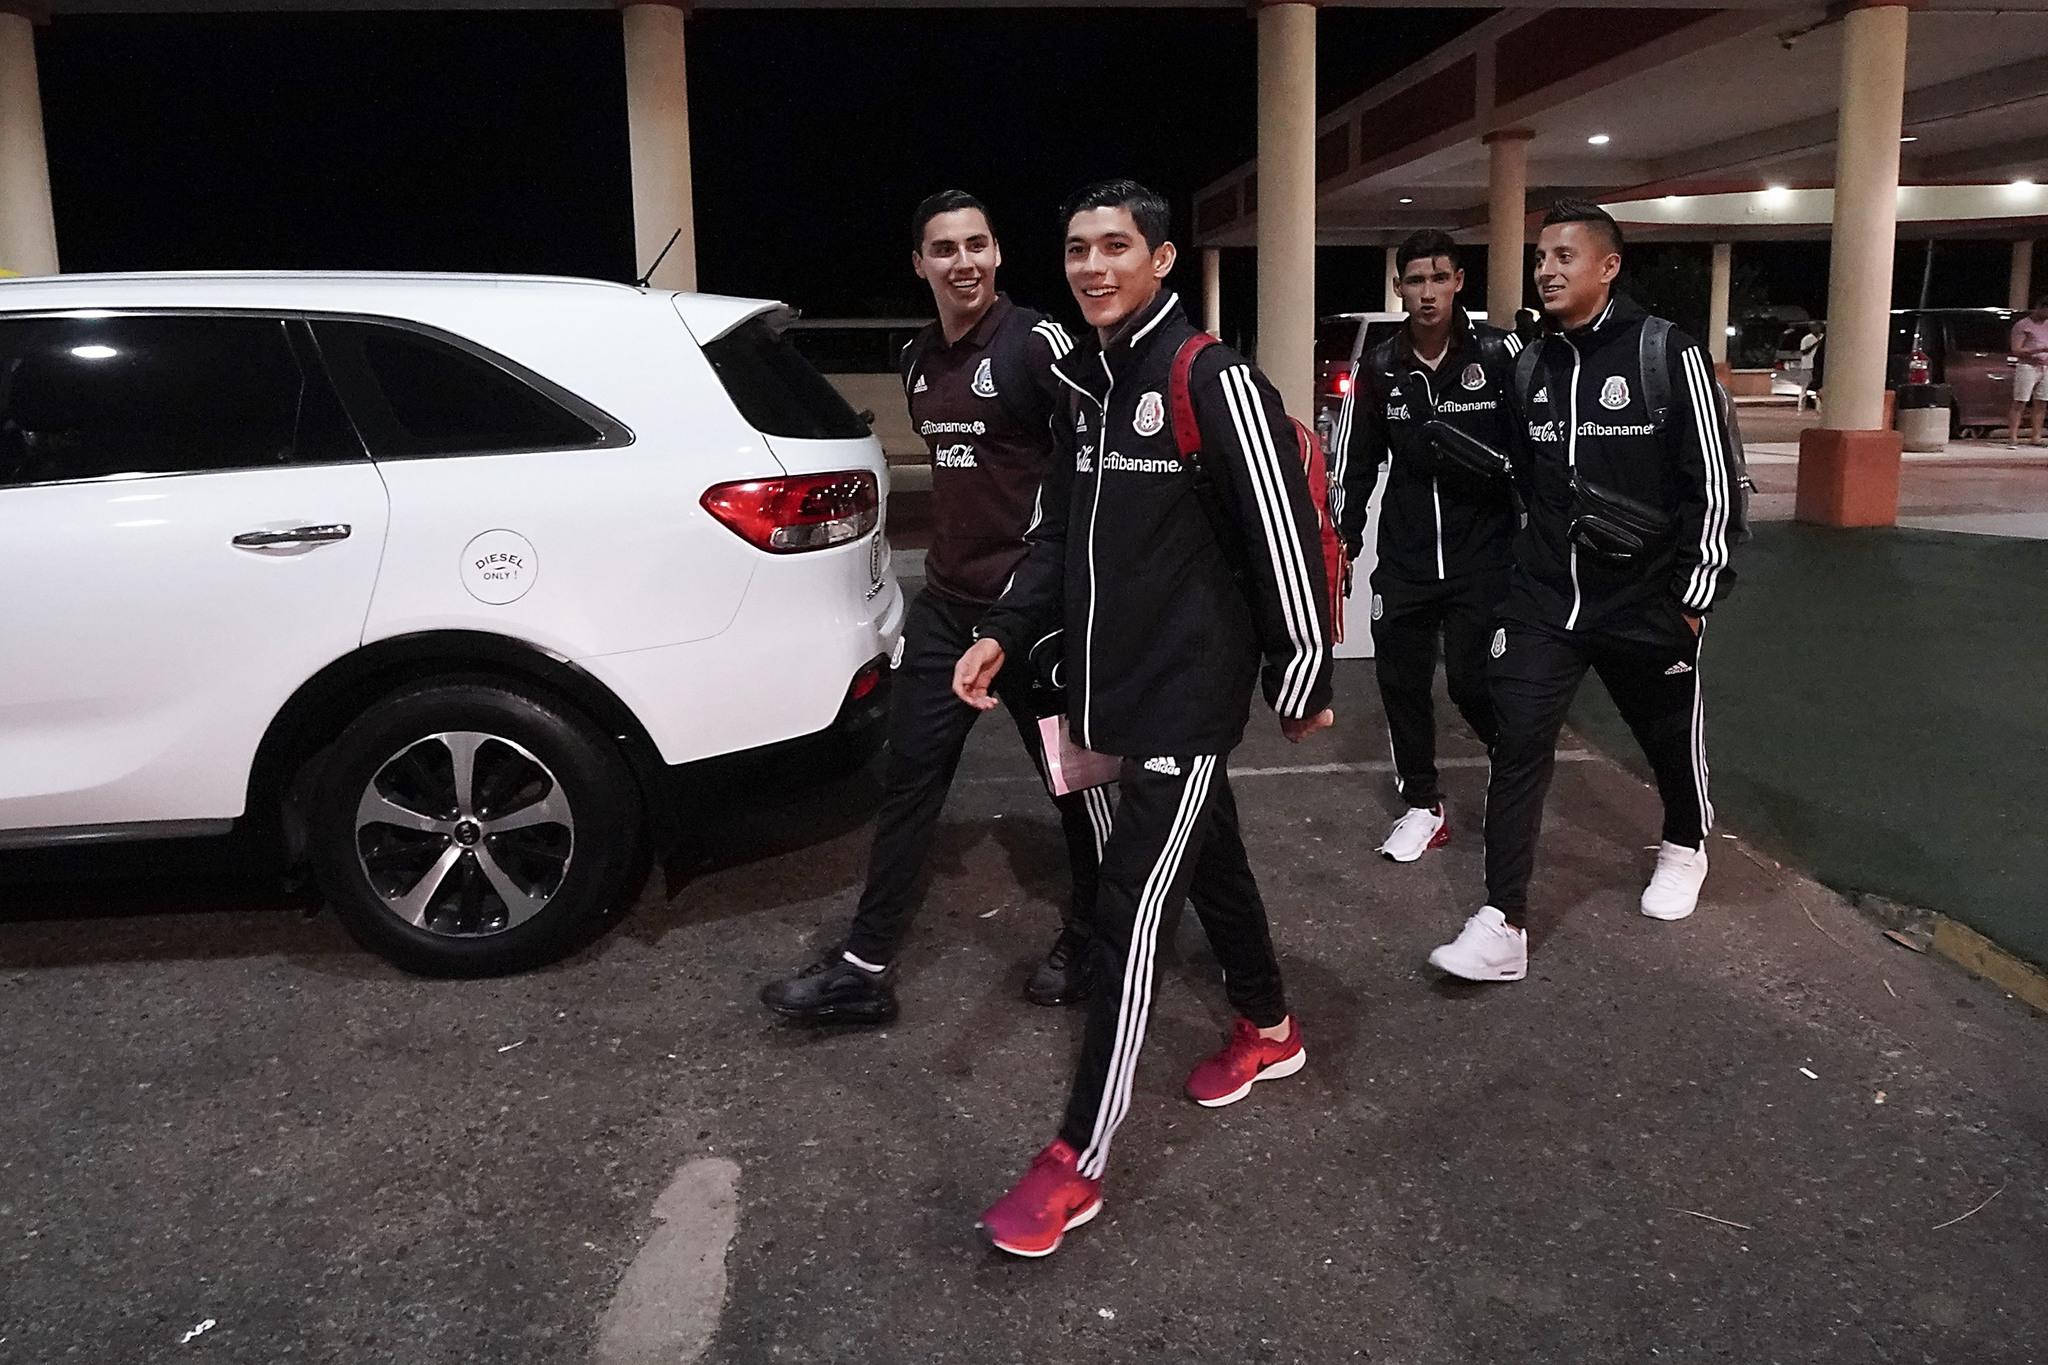 México cumple al golear a Bermudas